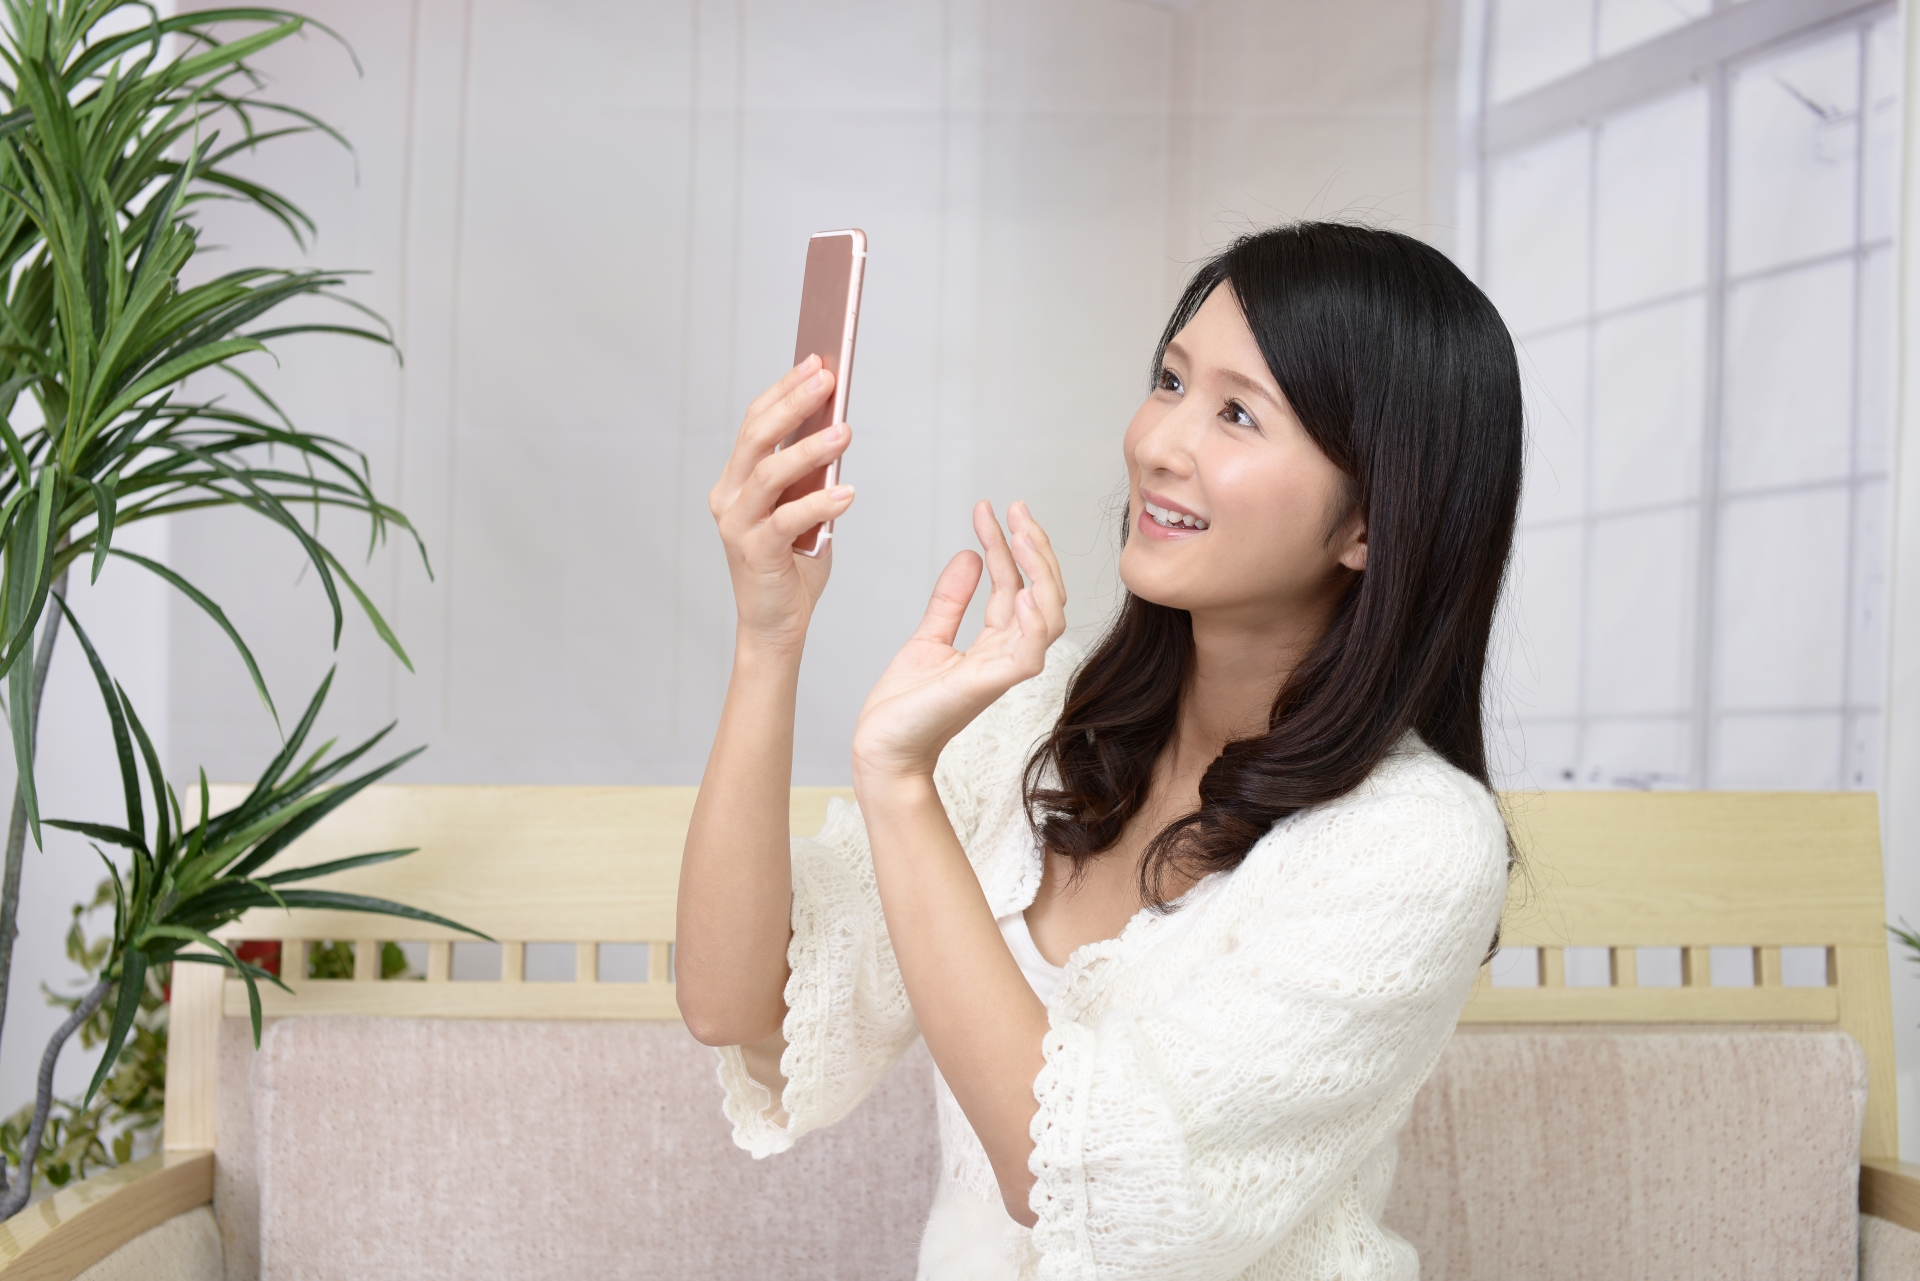 iphone・スマートホン